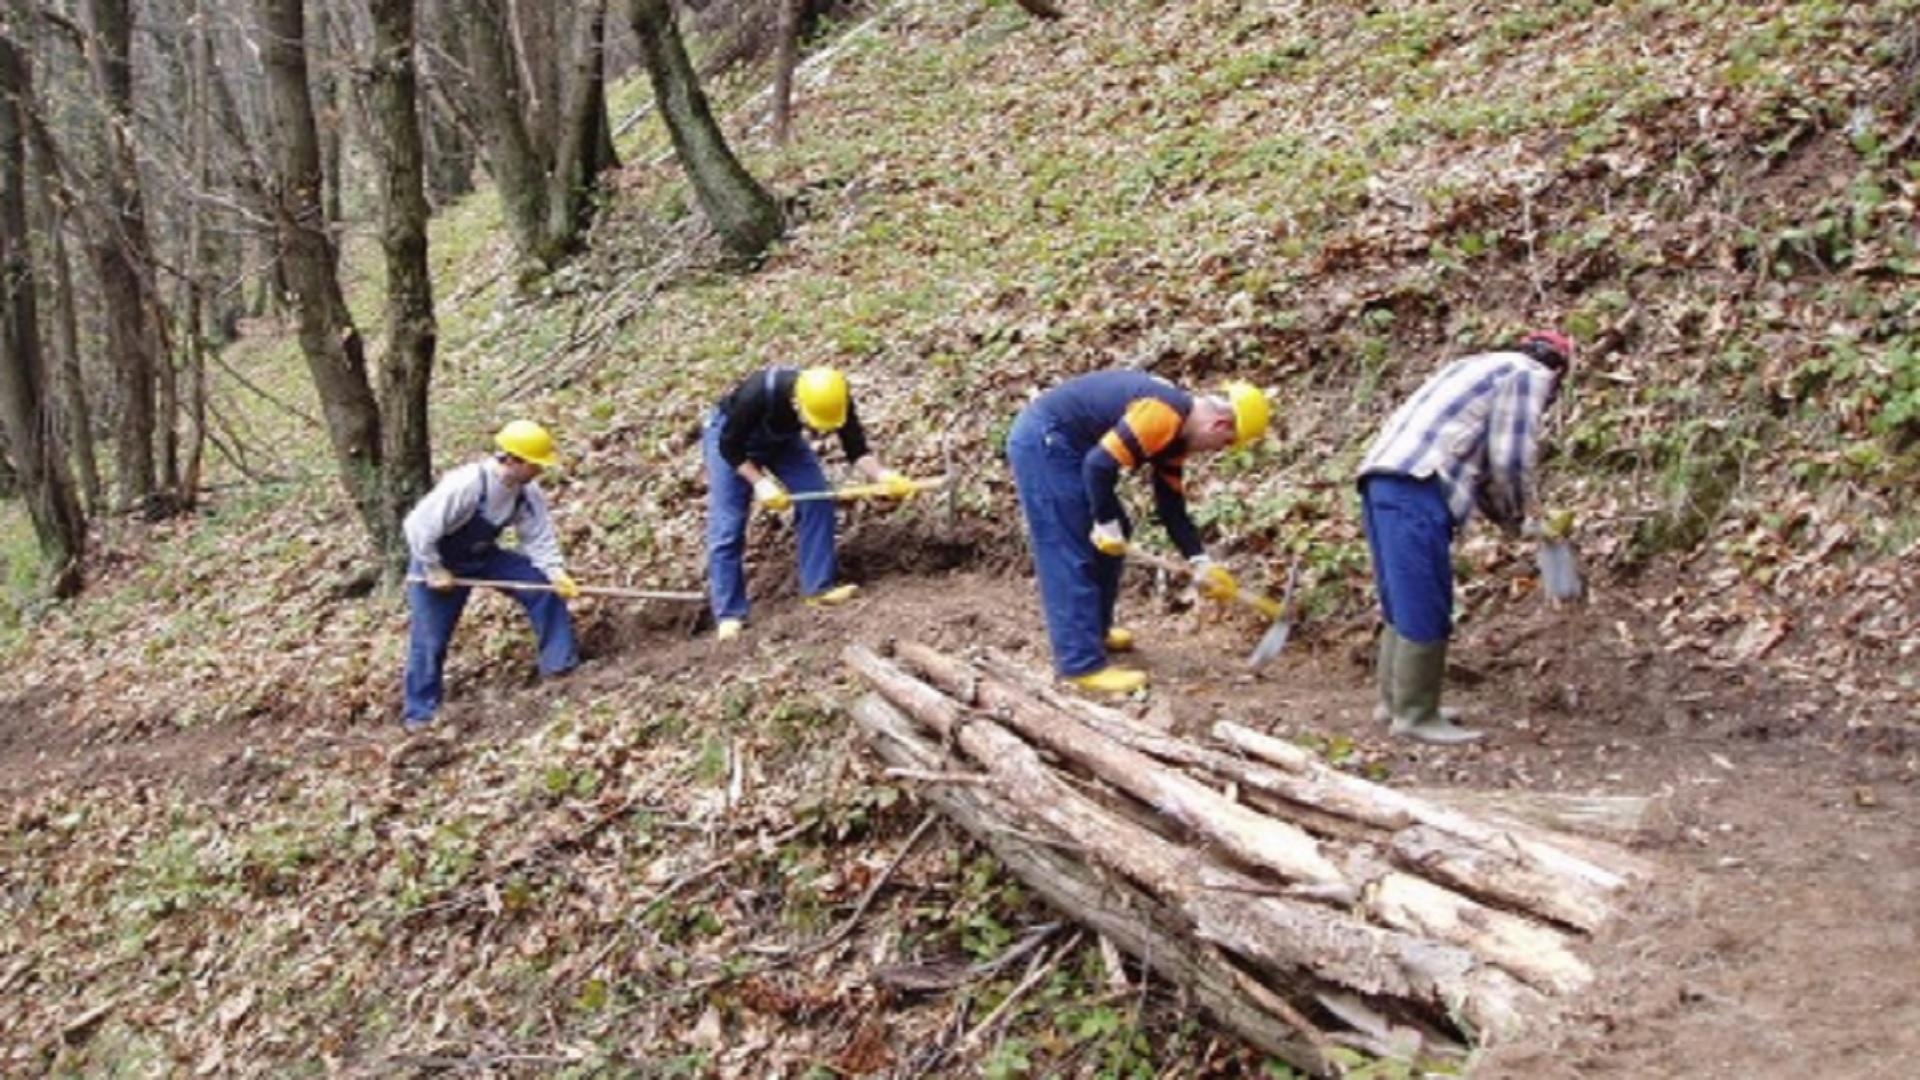 operai forestali